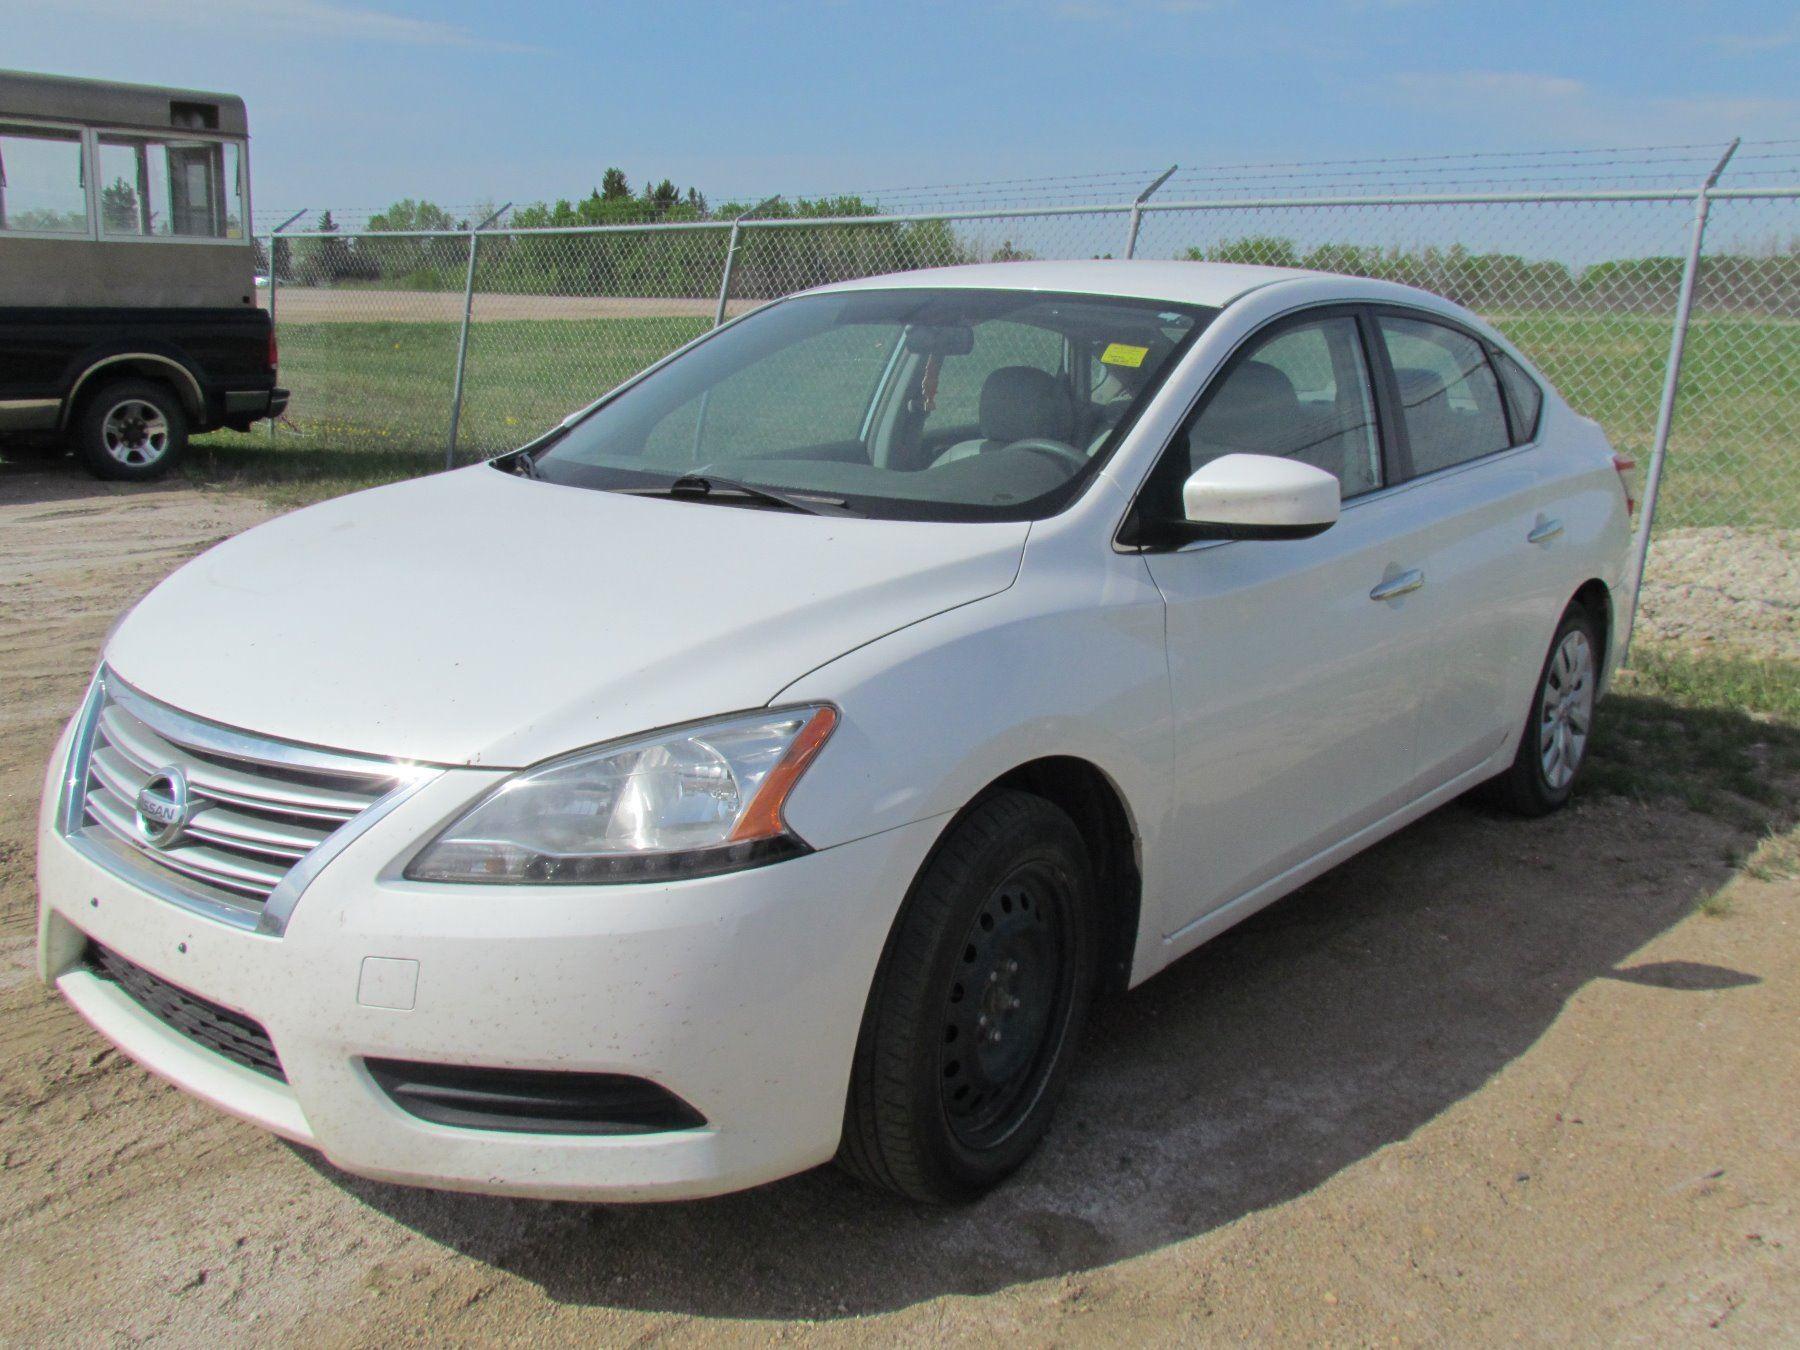 2013 Nissan Sentra Transmission >> 2013 Nissan Sentra Automatic 182 000klms Has Transmission Problems 3n1ab7ap5dl700109